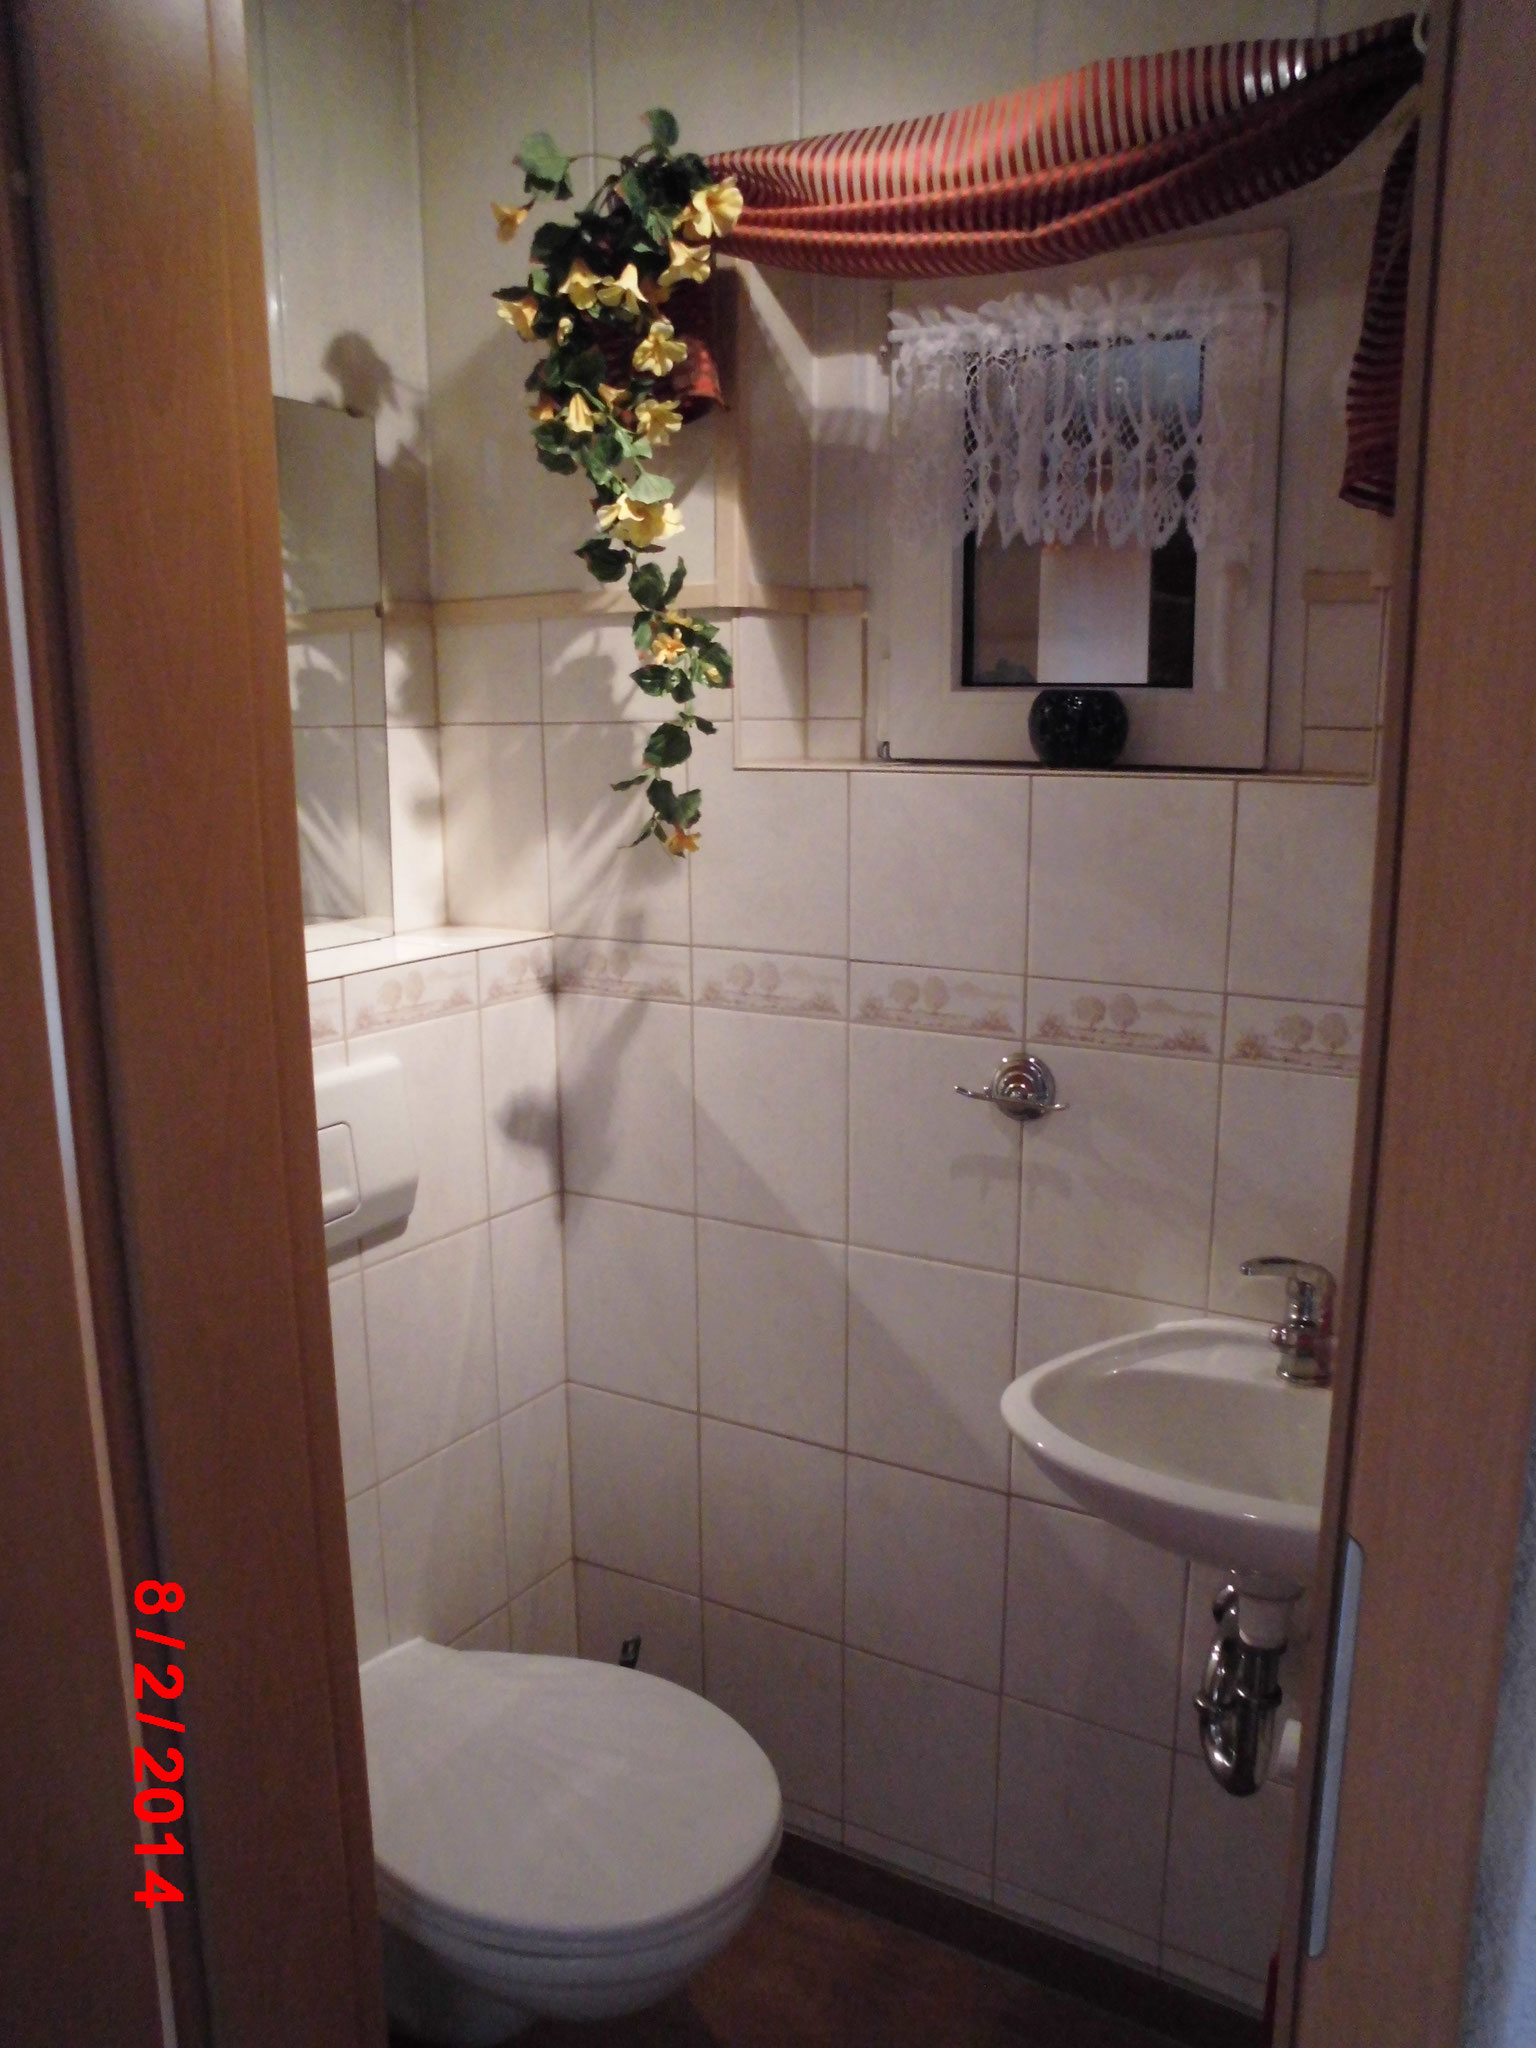 2. Toilette Haus 1